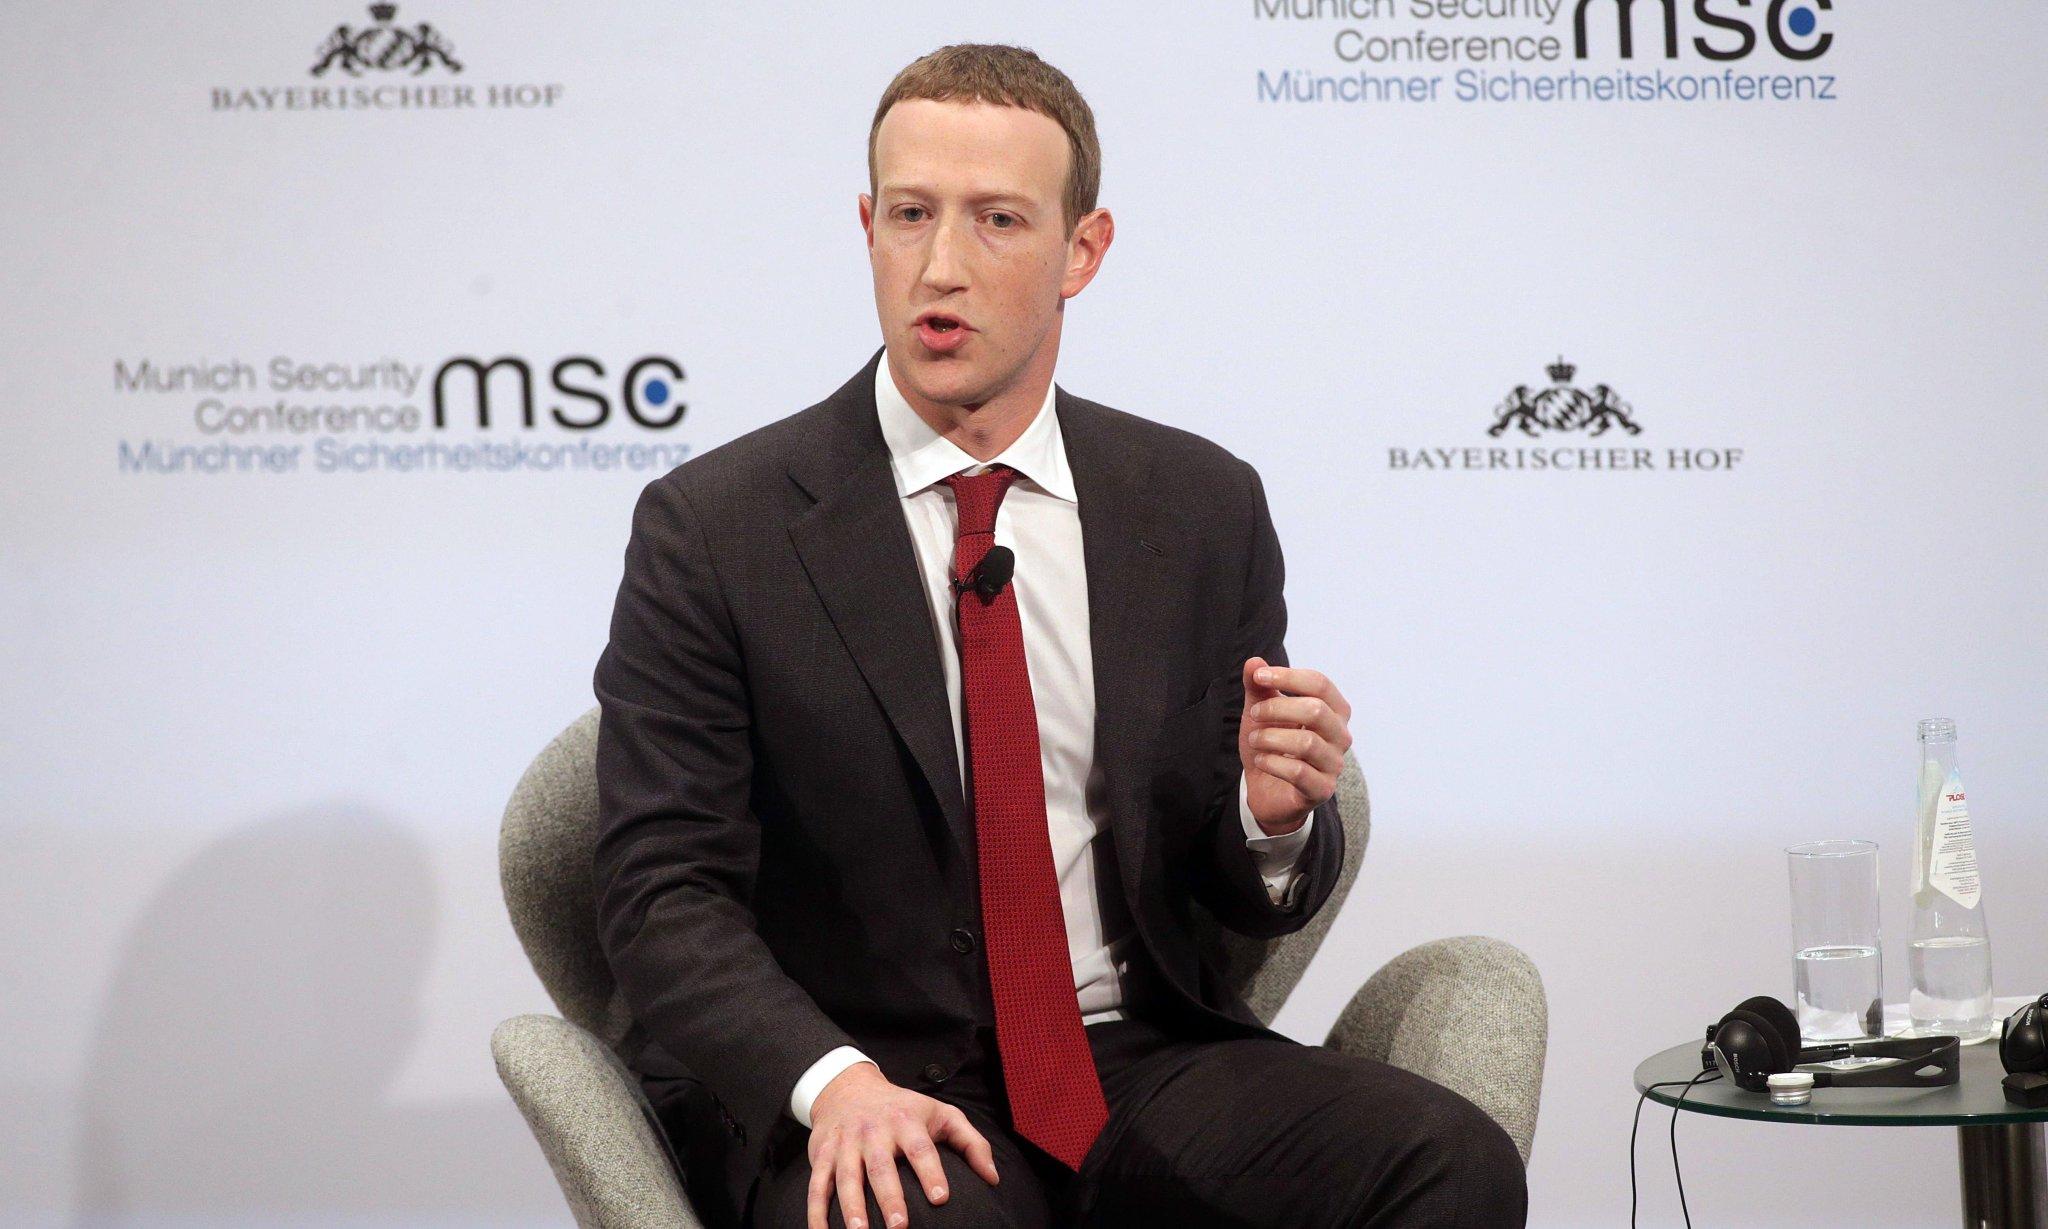 Facebook steps up fight against climate misinformation – but critics say effort falls short